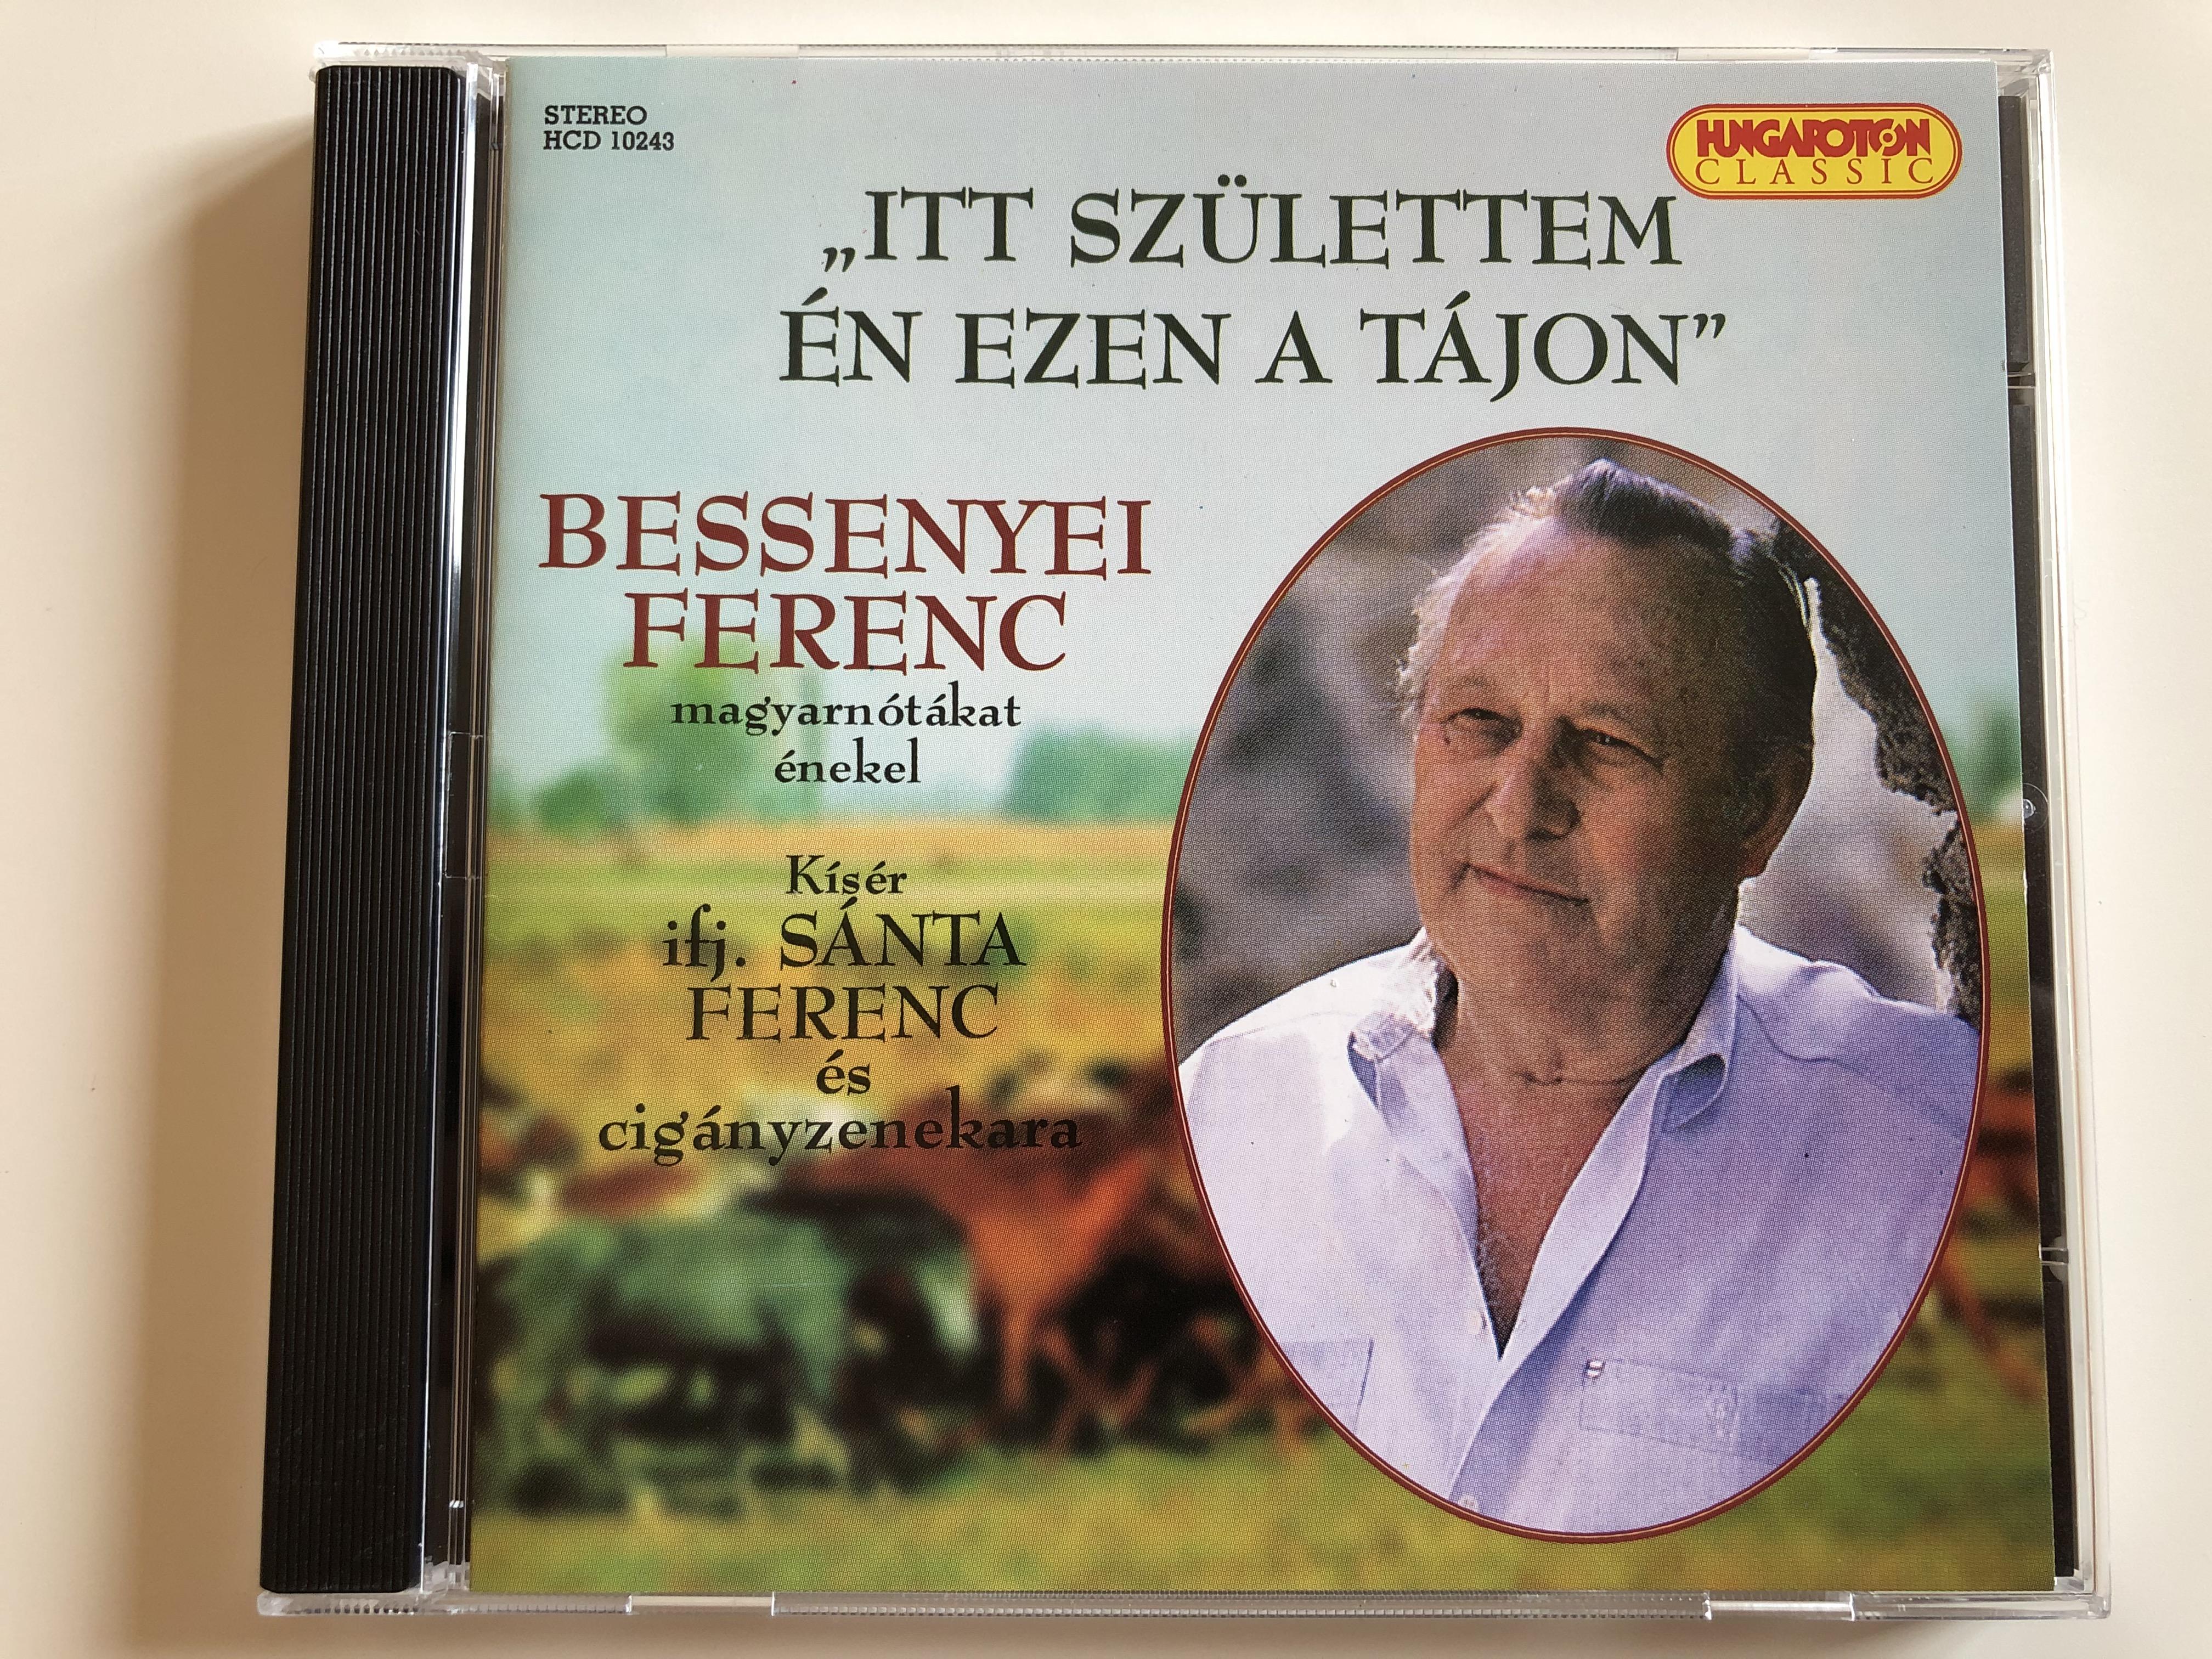 -itt-sz-lettem-n-ezen-a-t-jon-bessenyei-ferenc-kiser-ifj.-santa-ferenc-es-ciganyzenekara-hungaroton-classic-audio-cd-1990-stereo-hcd-10243-1-.jpg